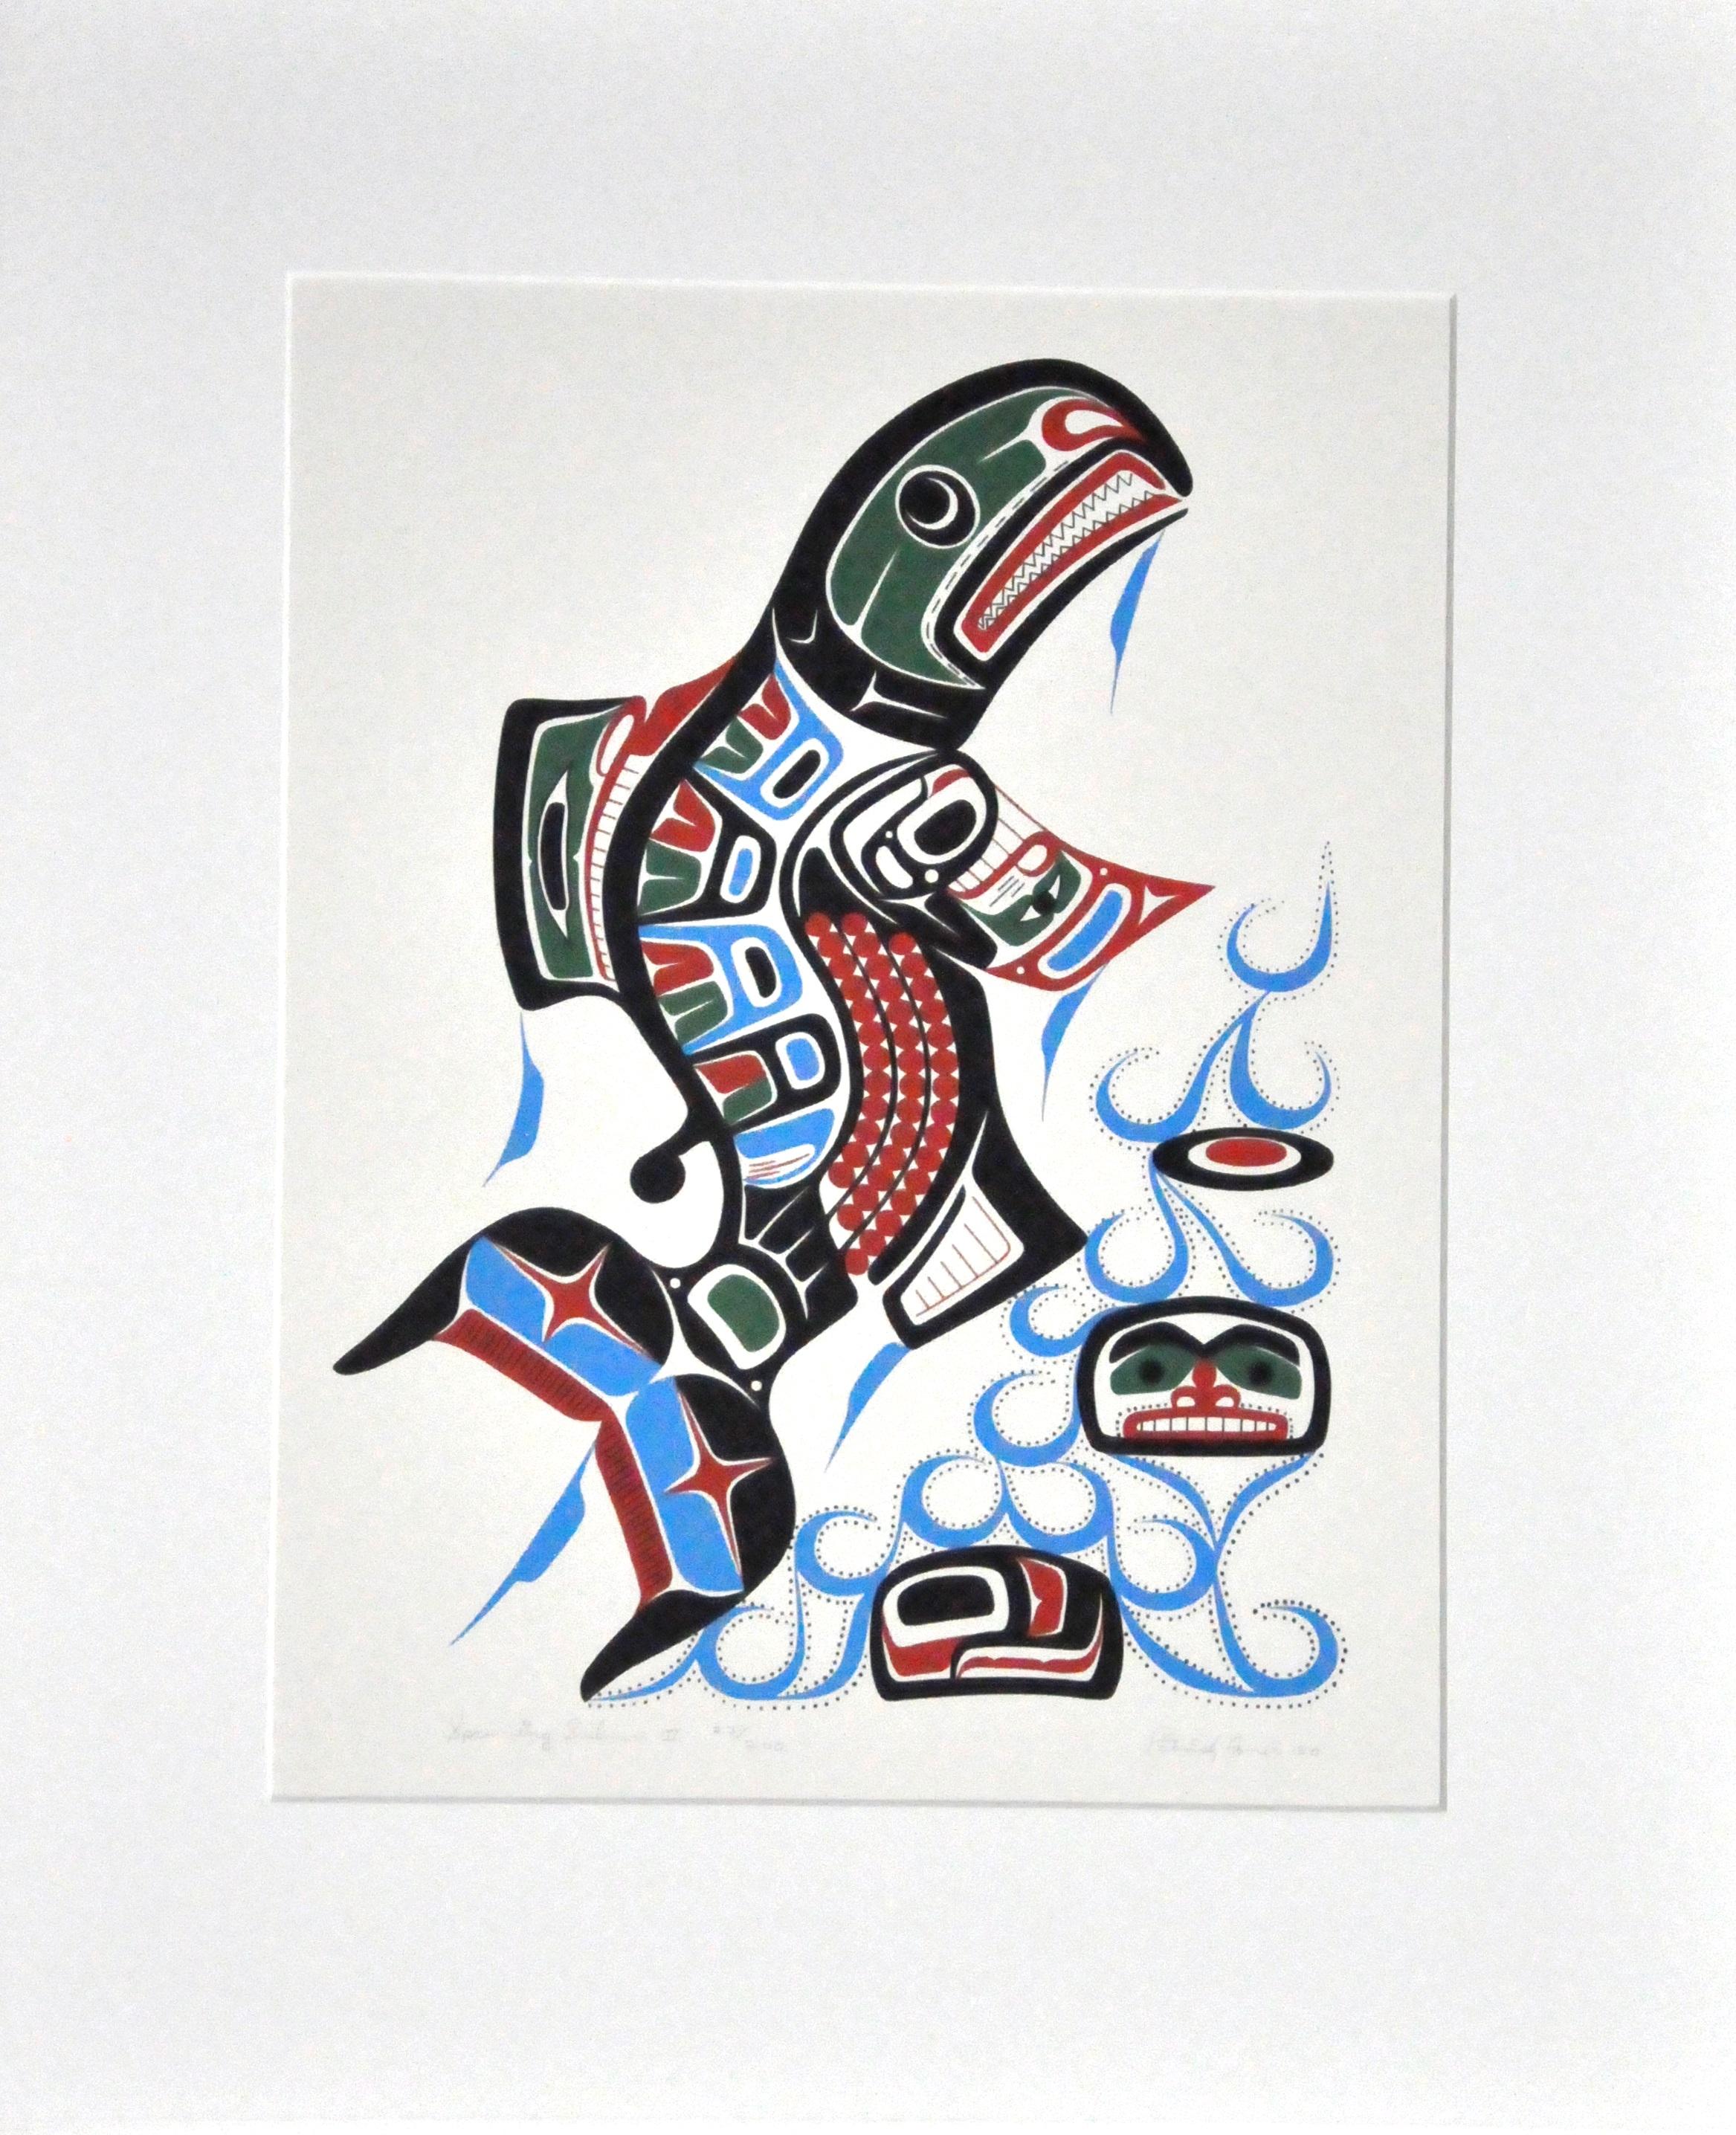 "Spawning Salmon II , 1980, Patrick Amos, serigraph, edition 23/200, 19"" x 14 1/2"", 2008.03.03"